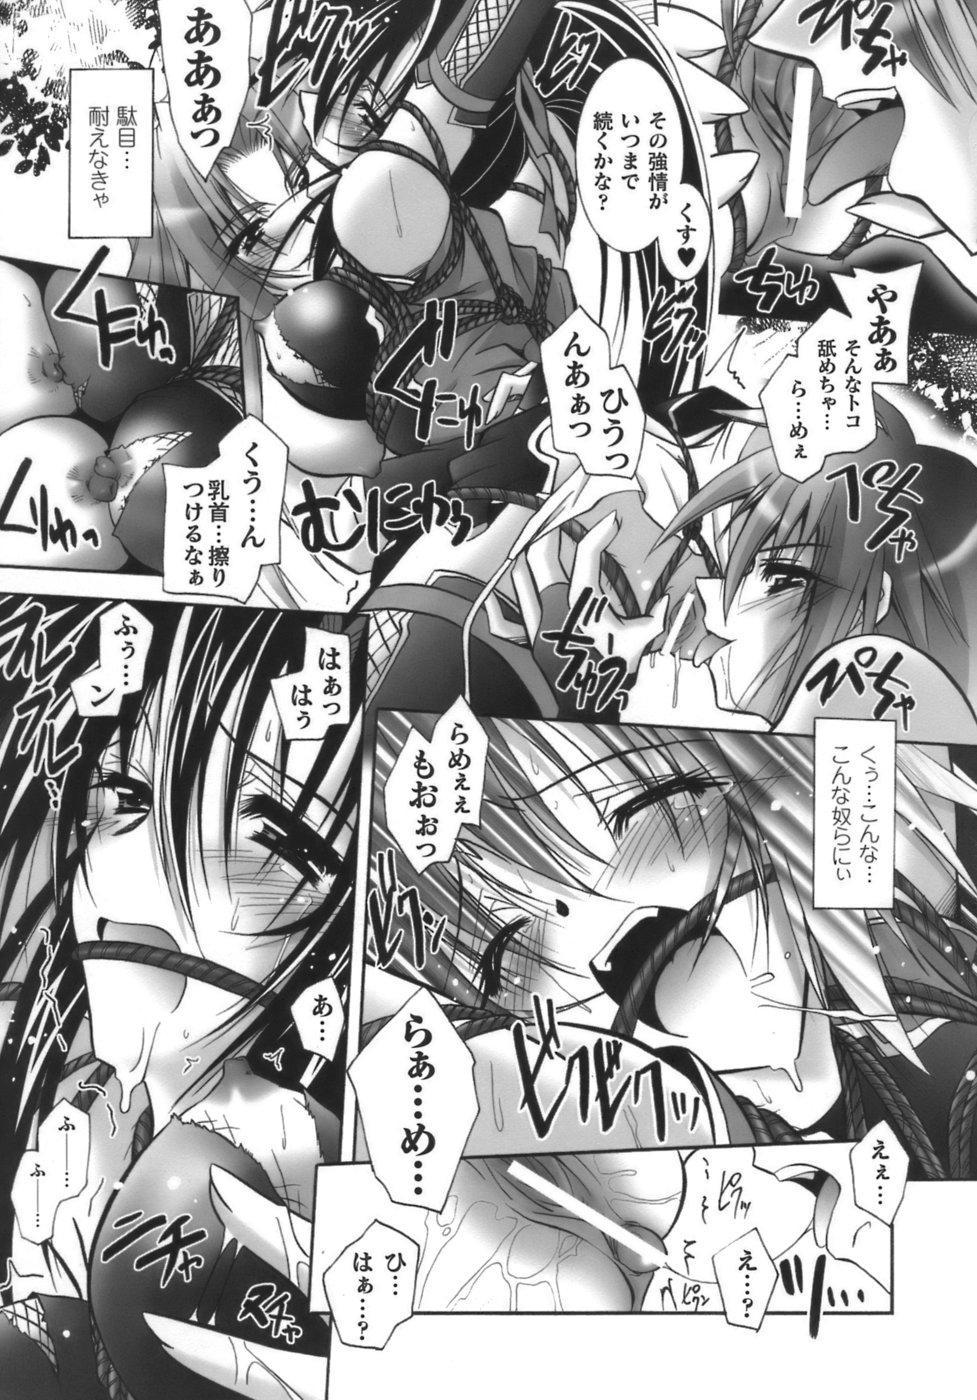 [Parfait] Datenshi-tachi no Chinkonka - Fallen Angels Requiem 47